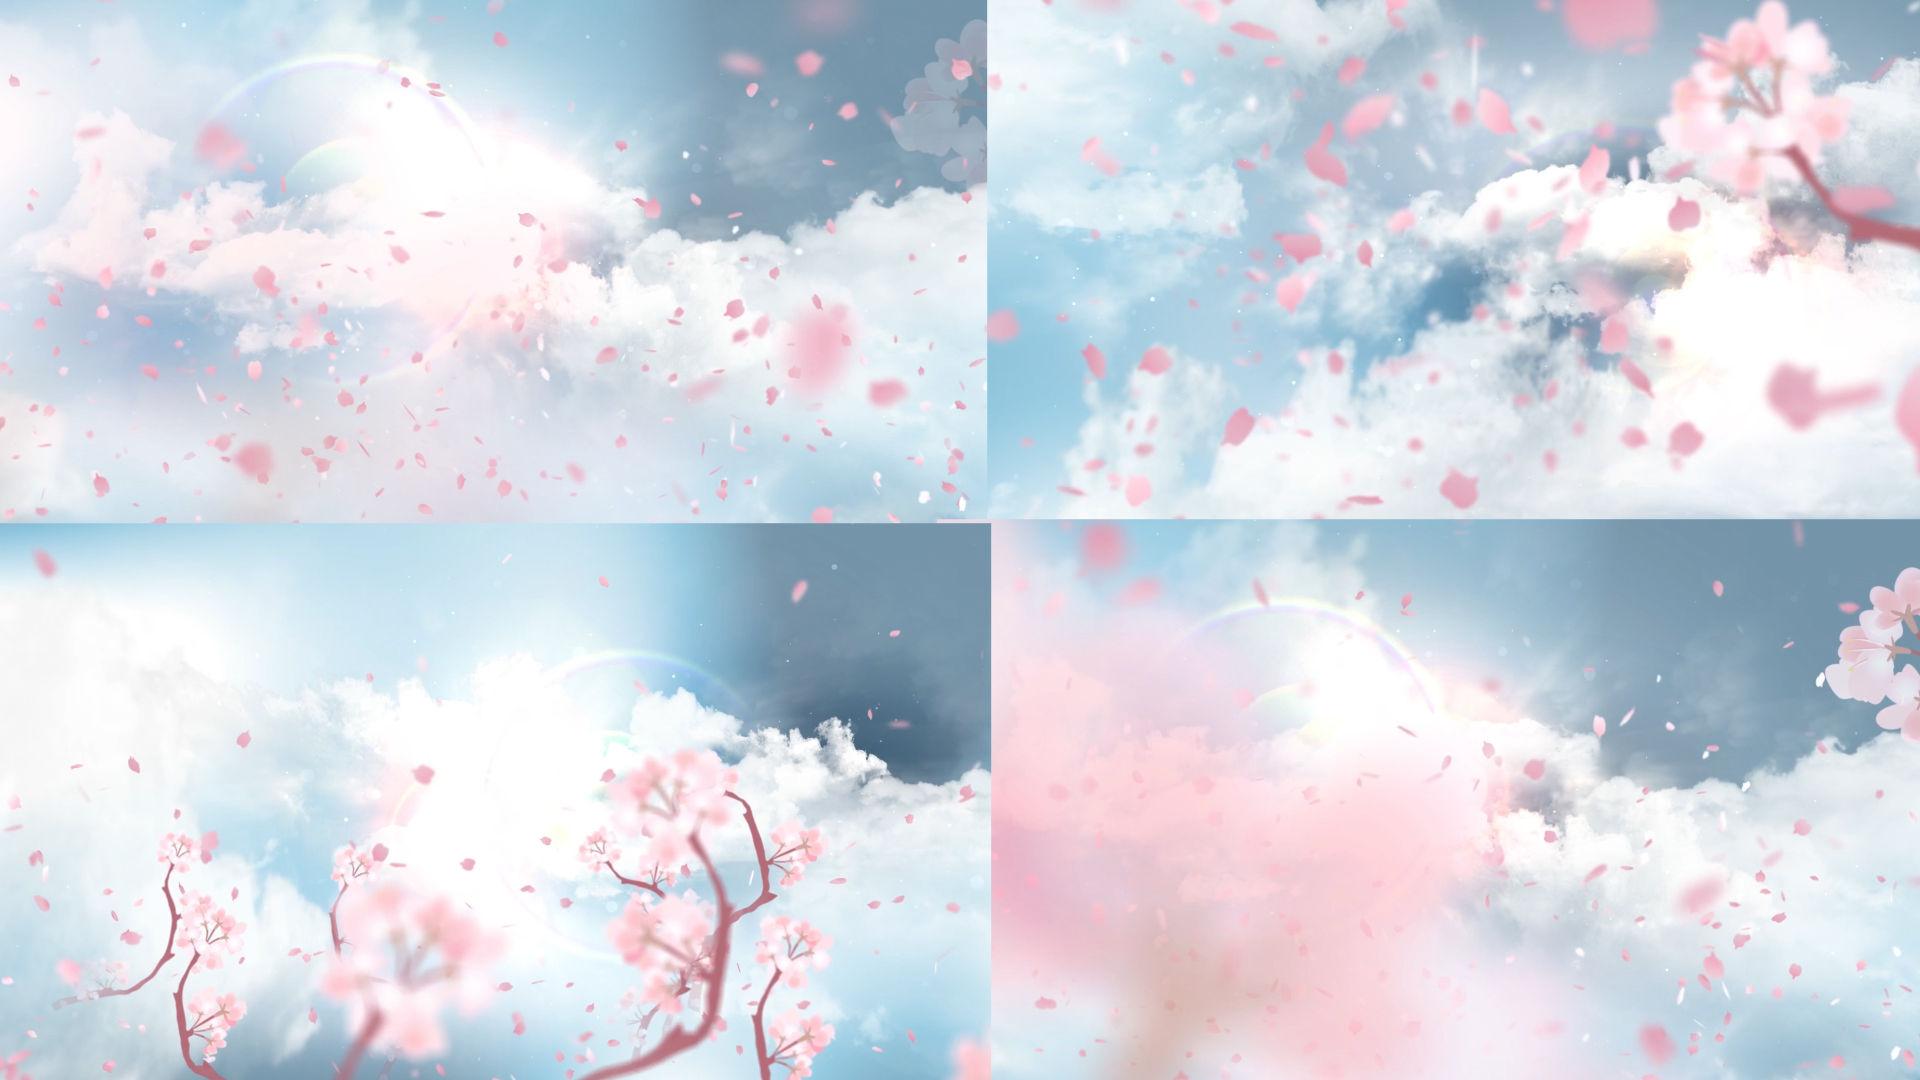 大气唯美梦幻LED背景视频